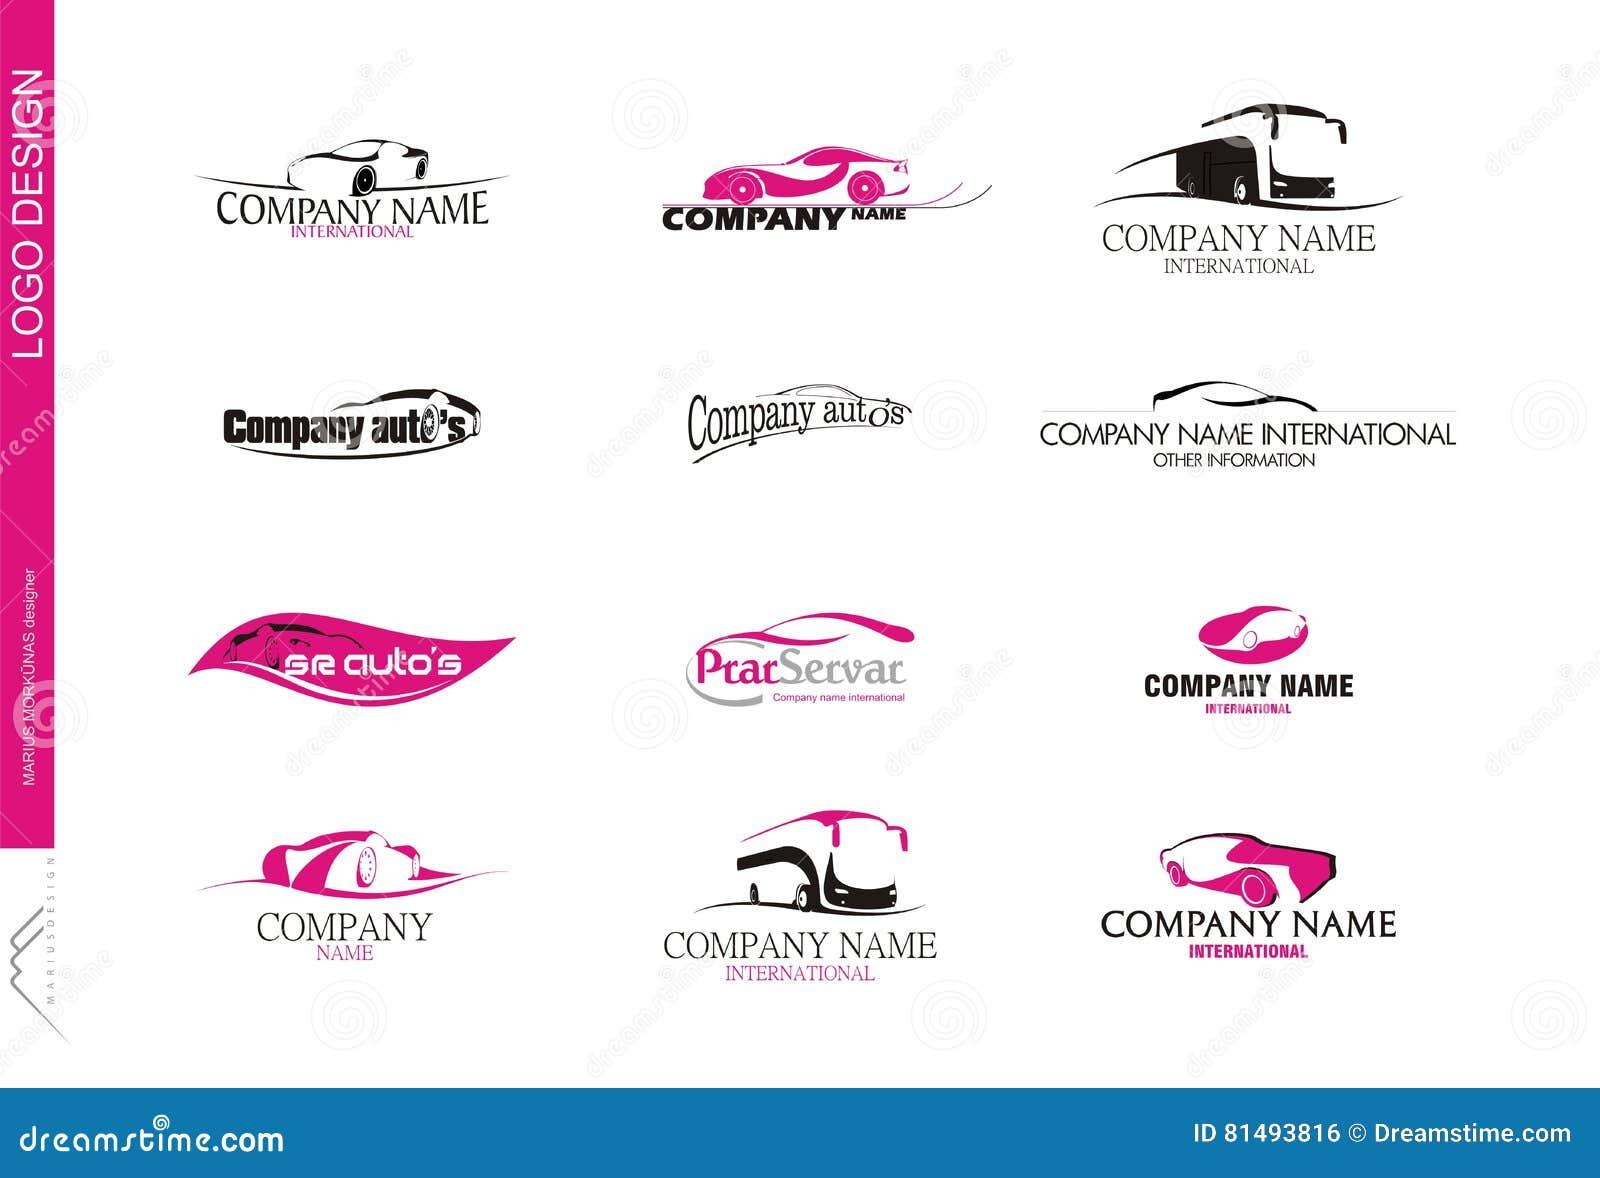 International company names and logos for International design company